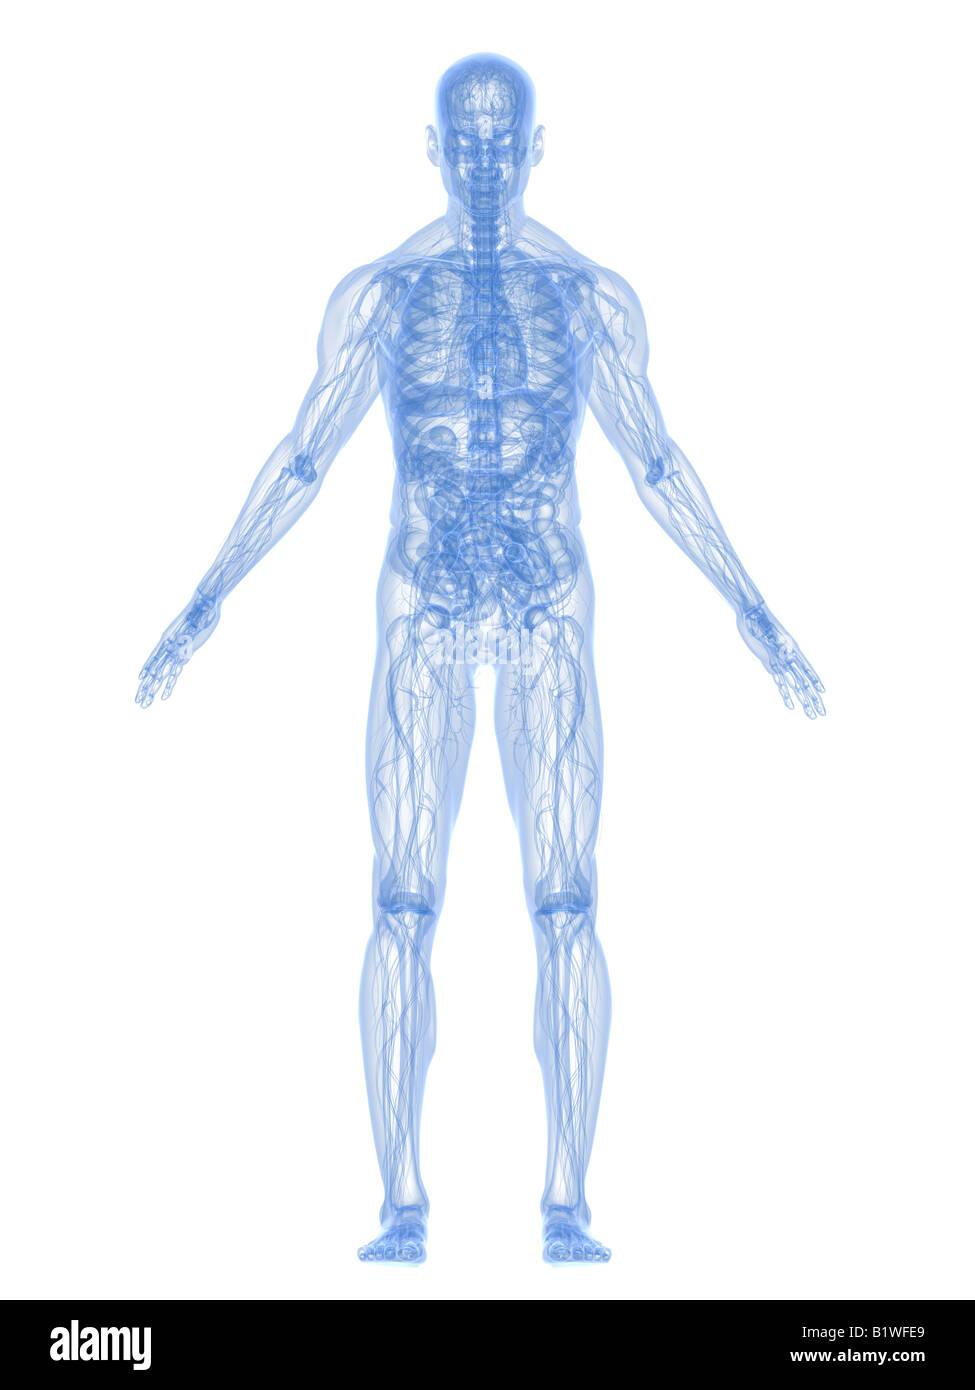 x-ray anatomy - Stock Image